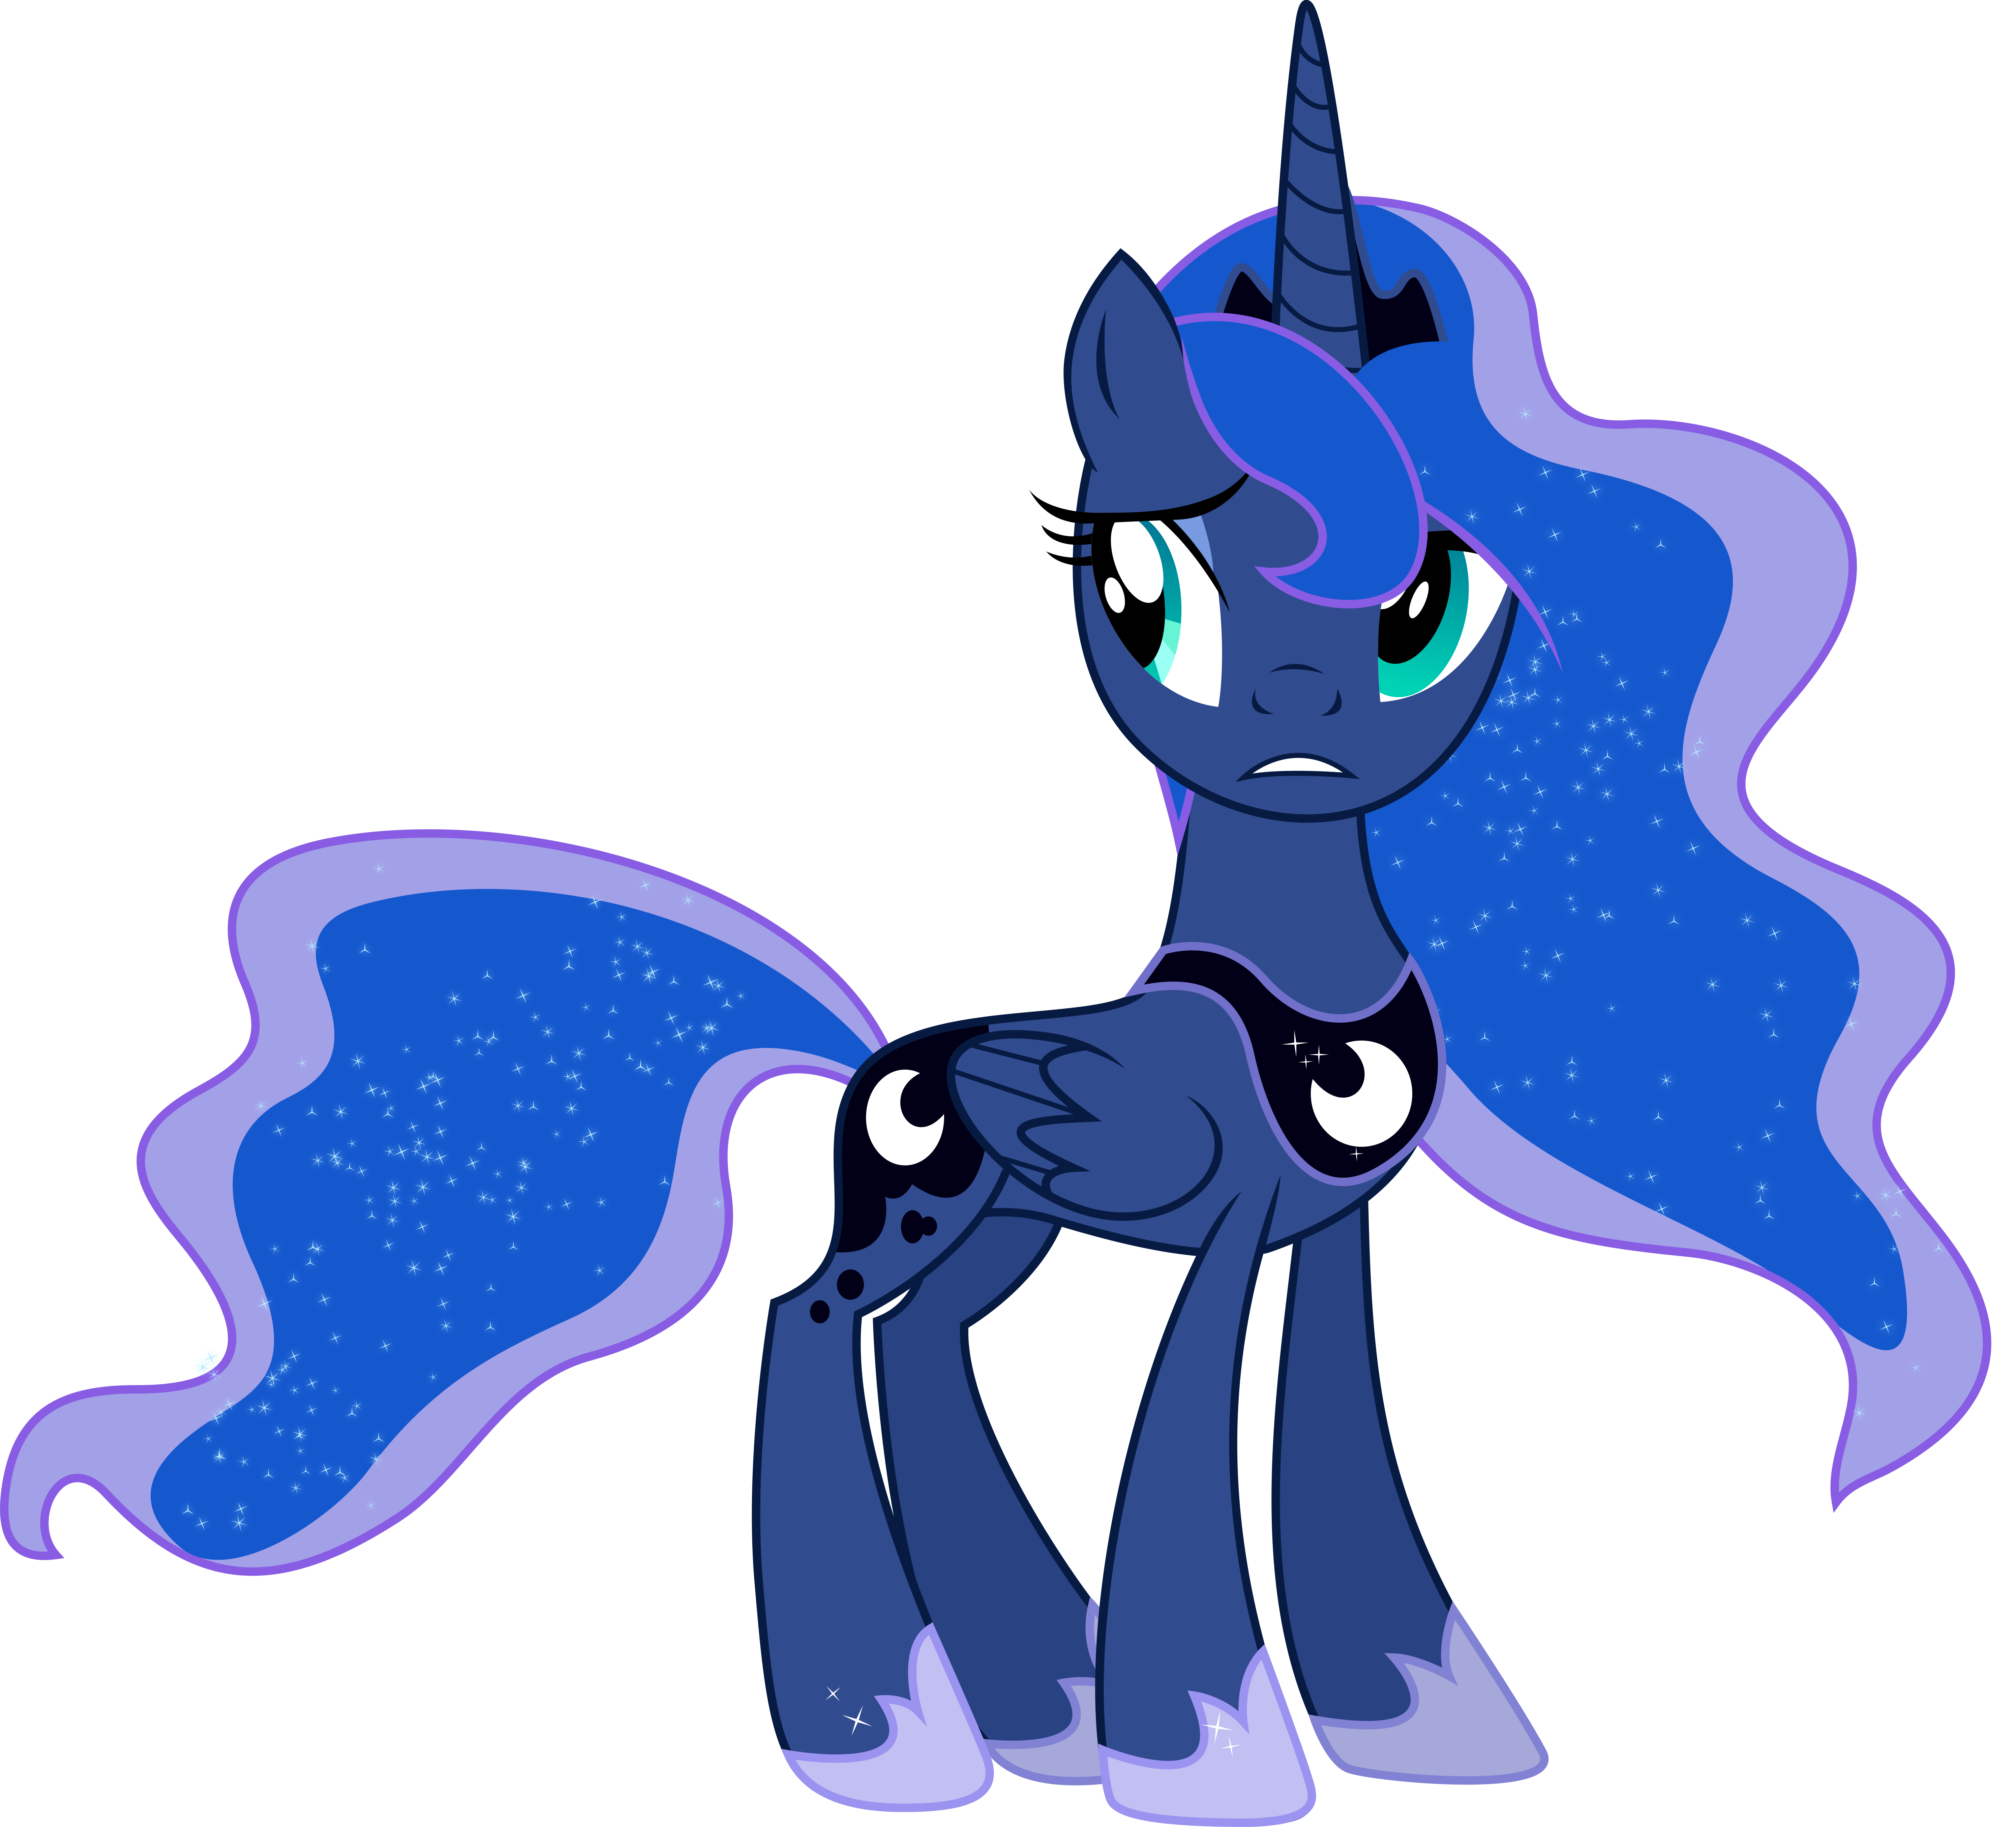 Worried Princess Luna